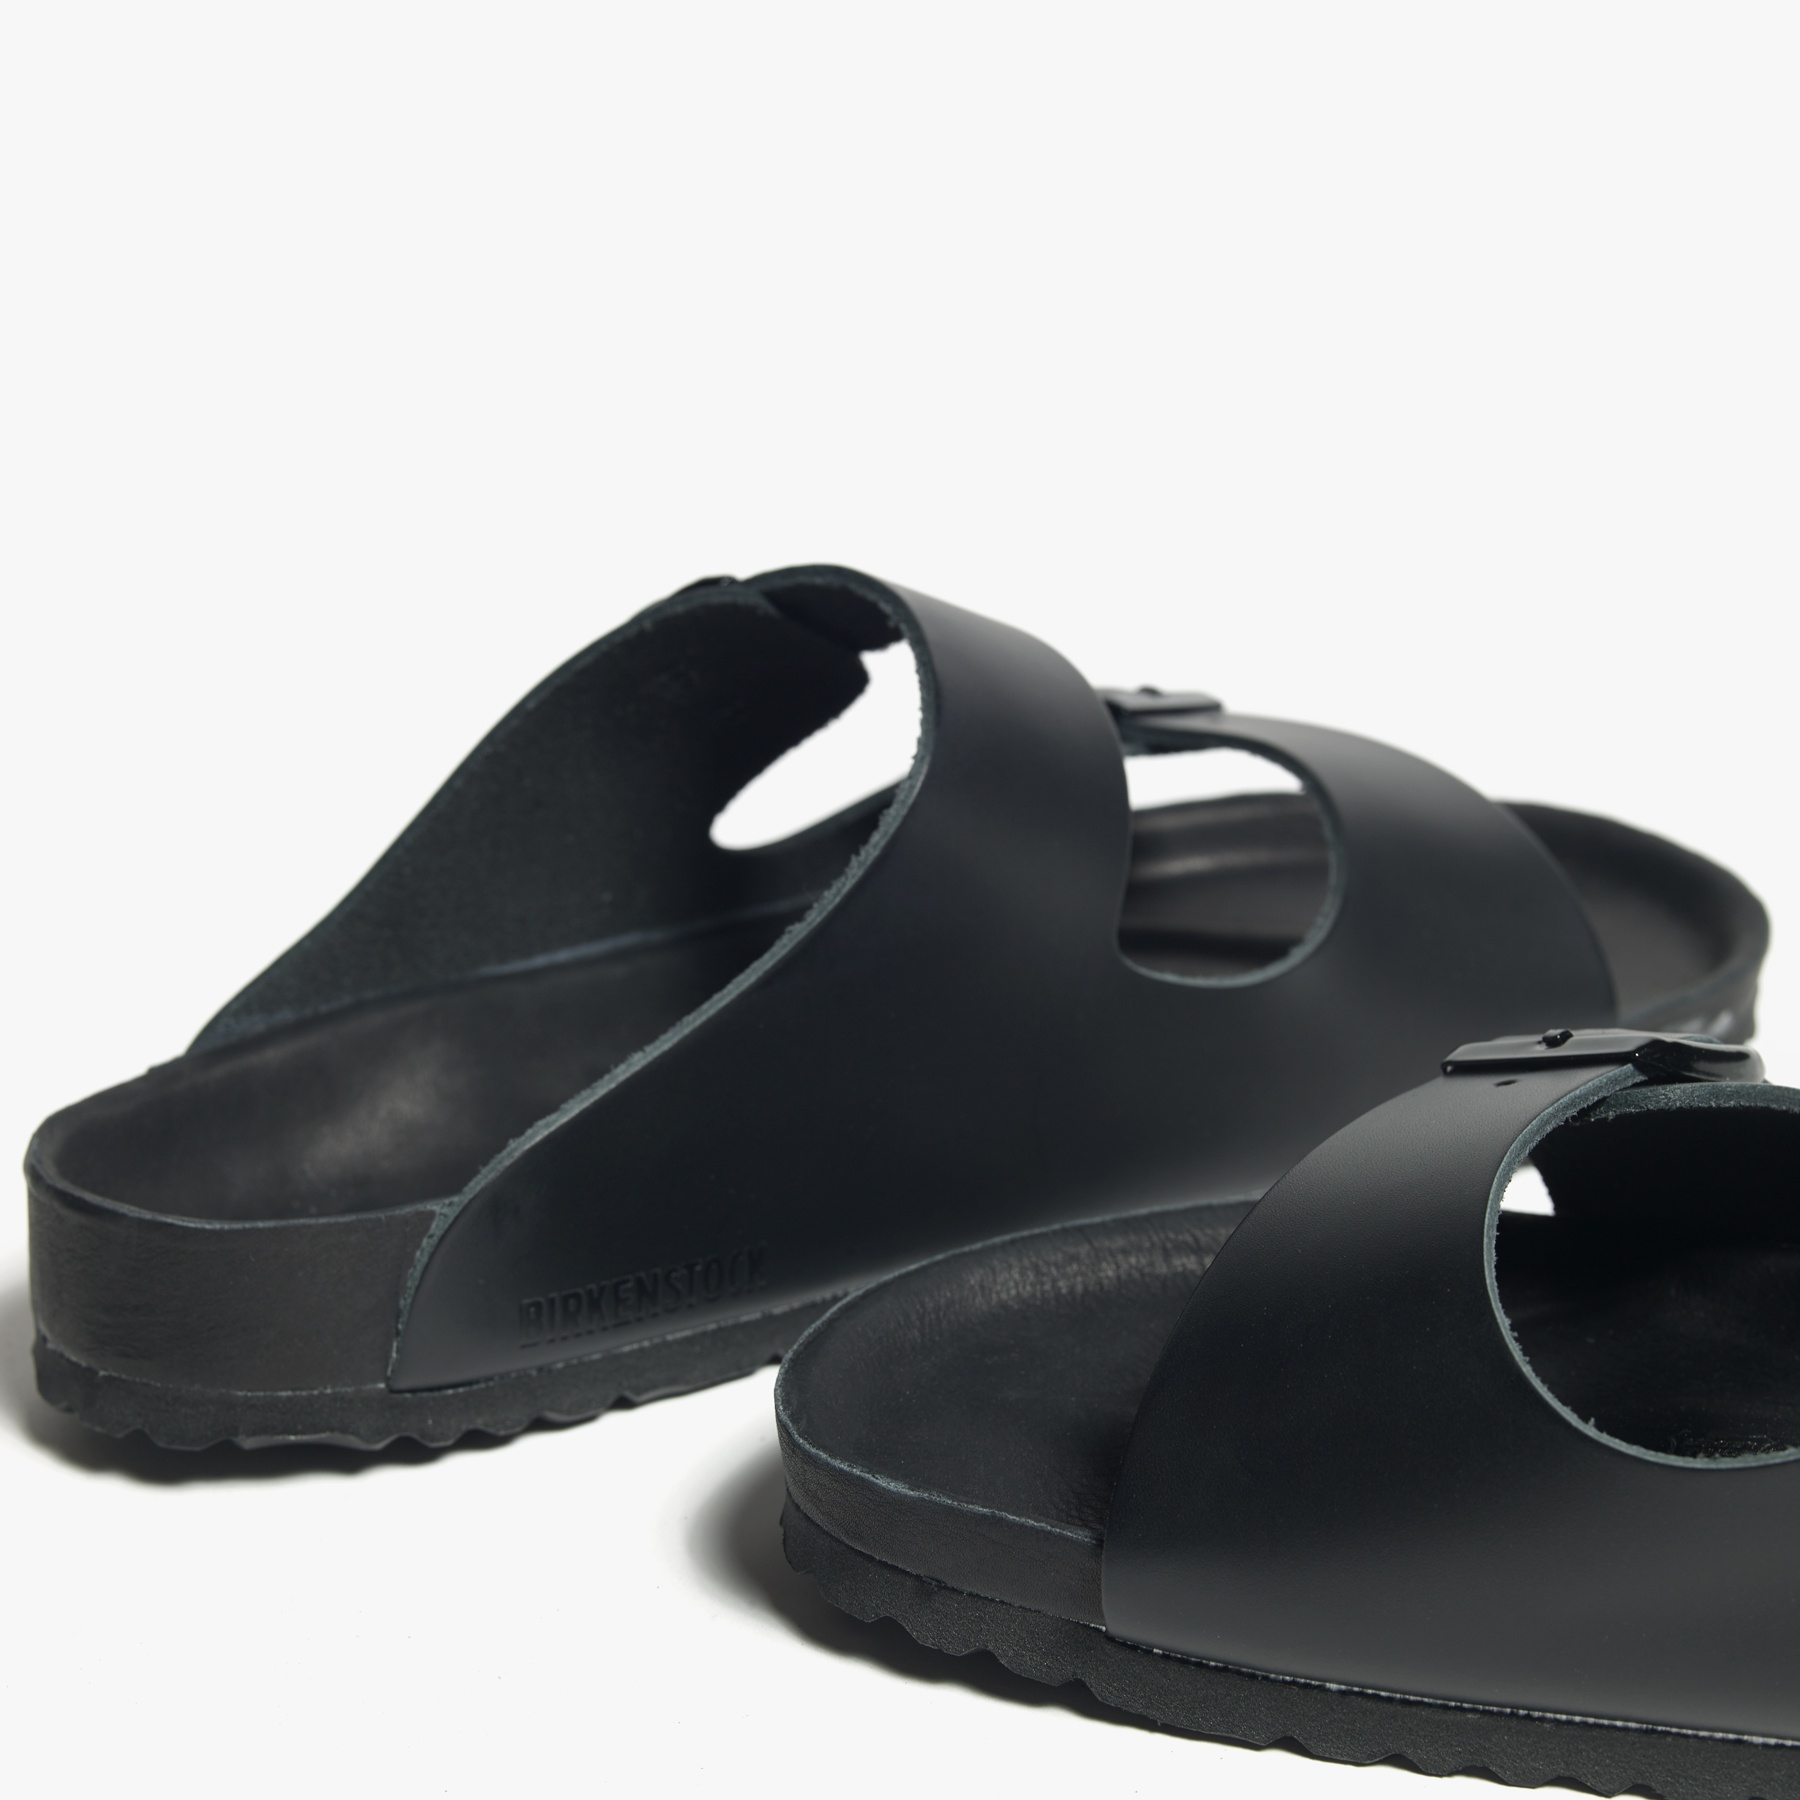 048dba23c Lyst - James Perse Birkenstock Monterey Leather Sandal - Mens in ...